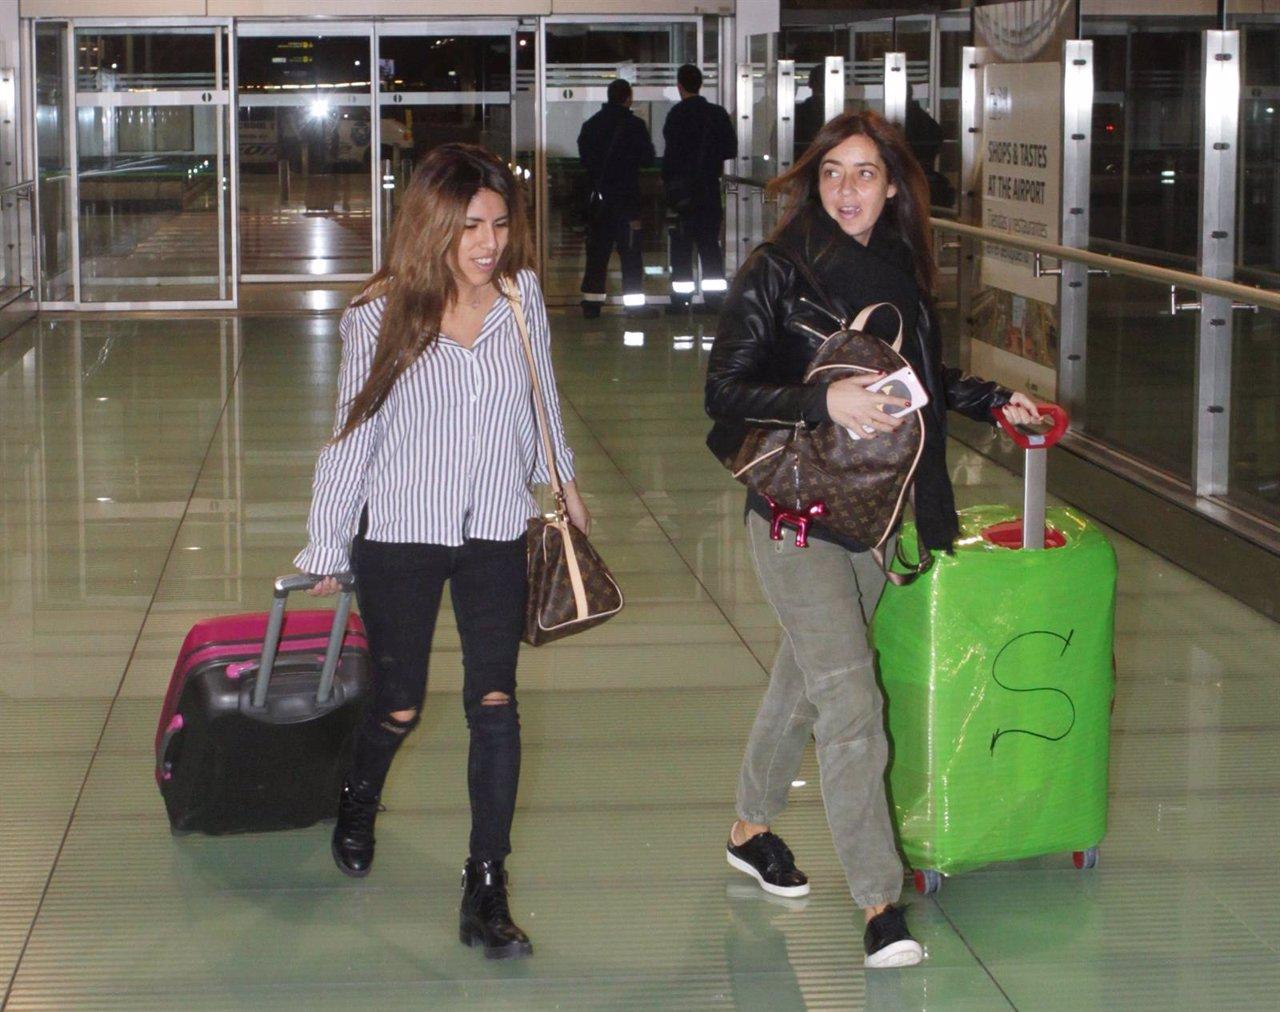 Exclusiva: Isa Pantoja pone rumbo a Chile para reencontrarse con su madre